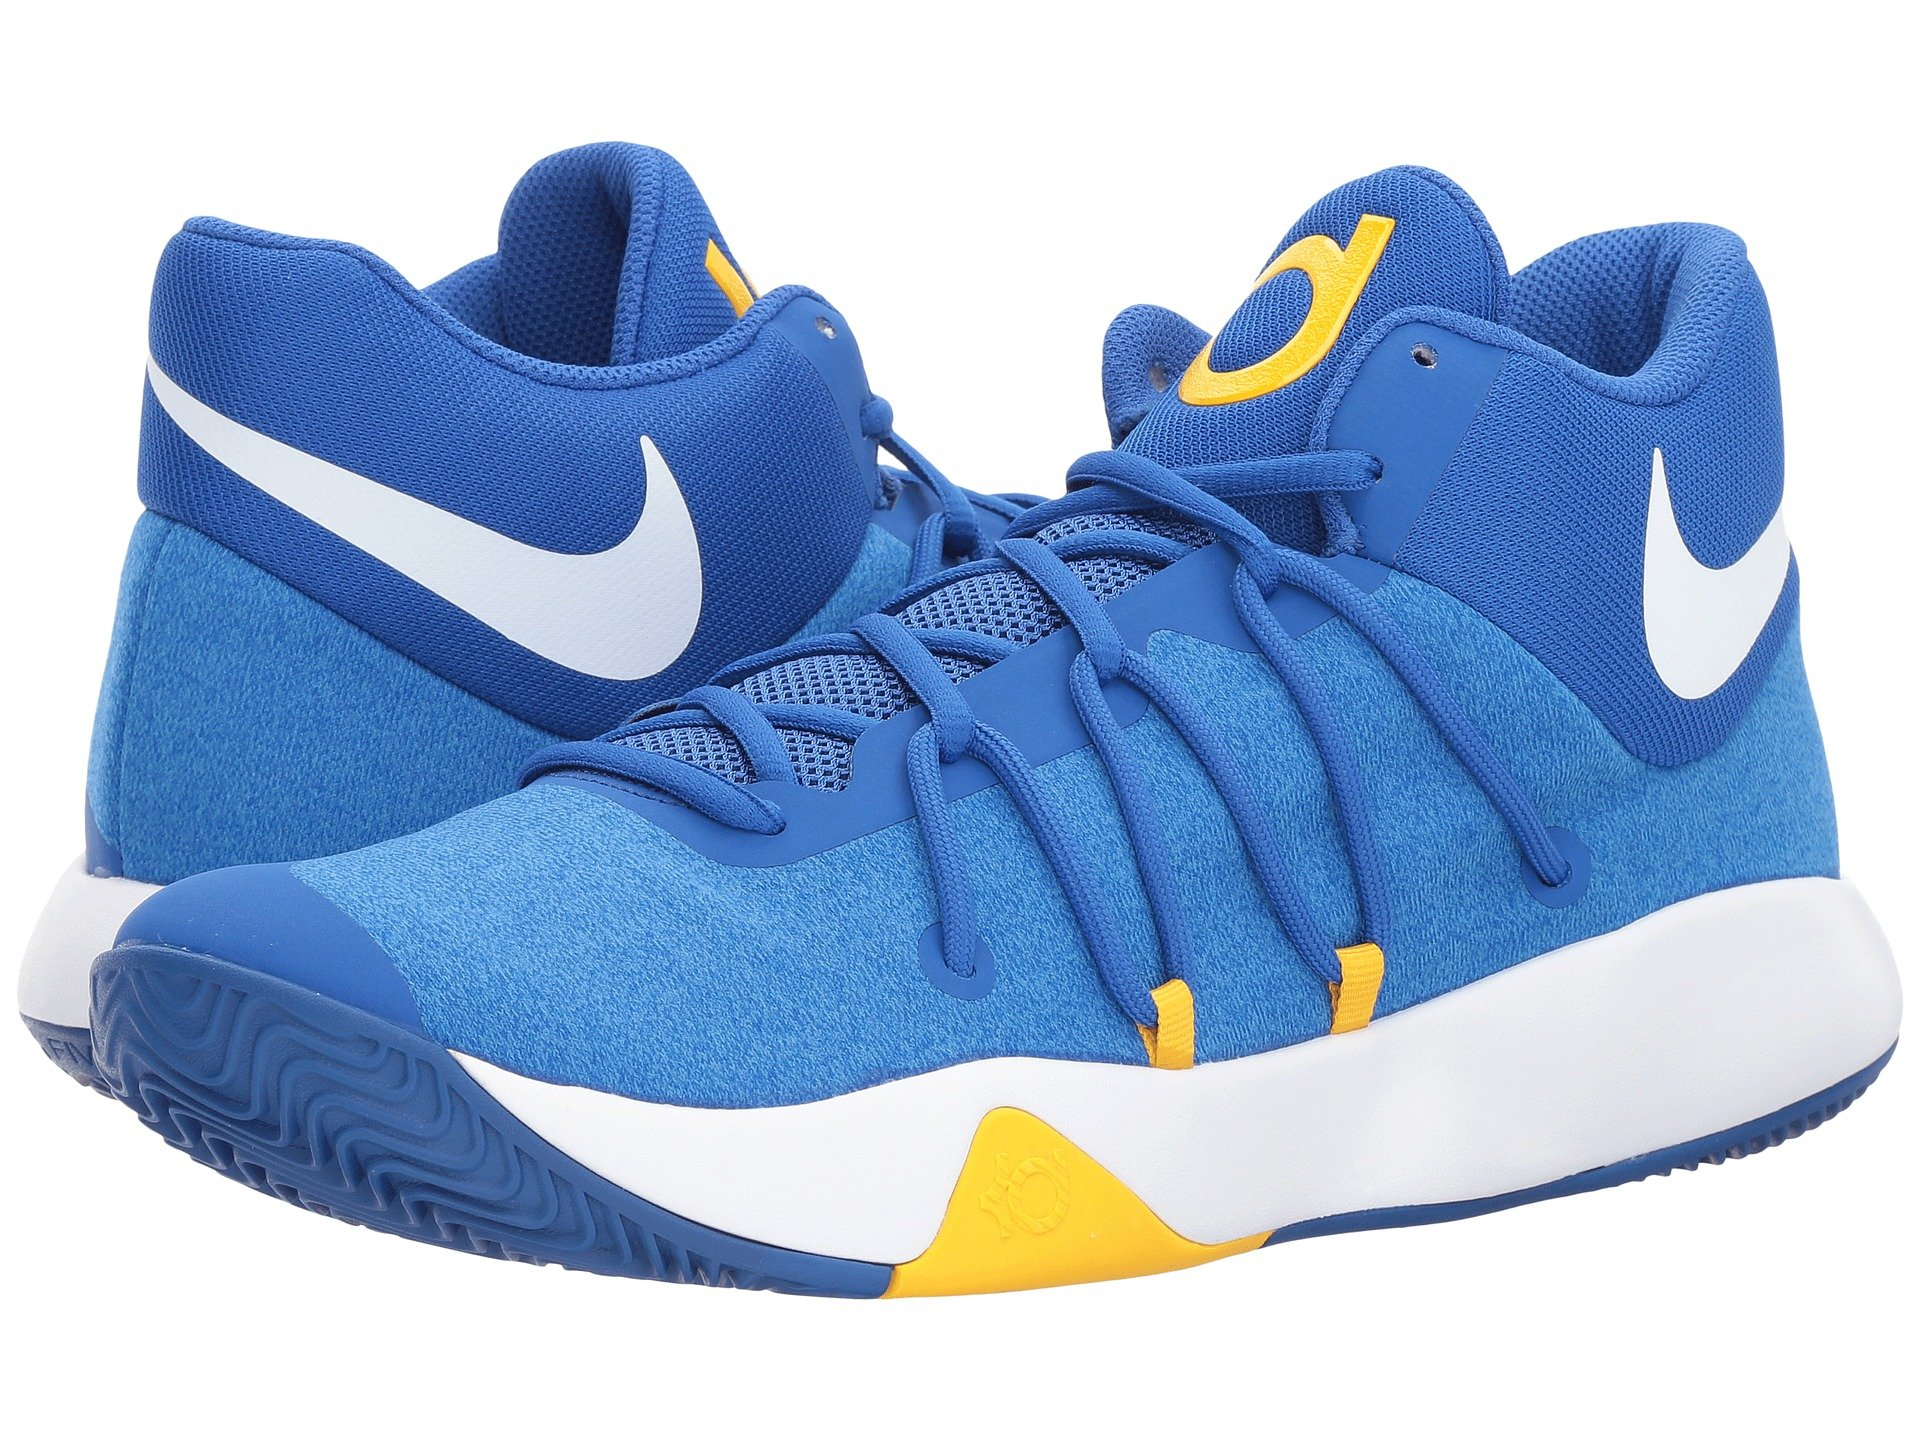 NIKE KD Trey 5 V Mens Fashion-Sneakers 897638-400_11.5 - Royal Blue/White-University Gold